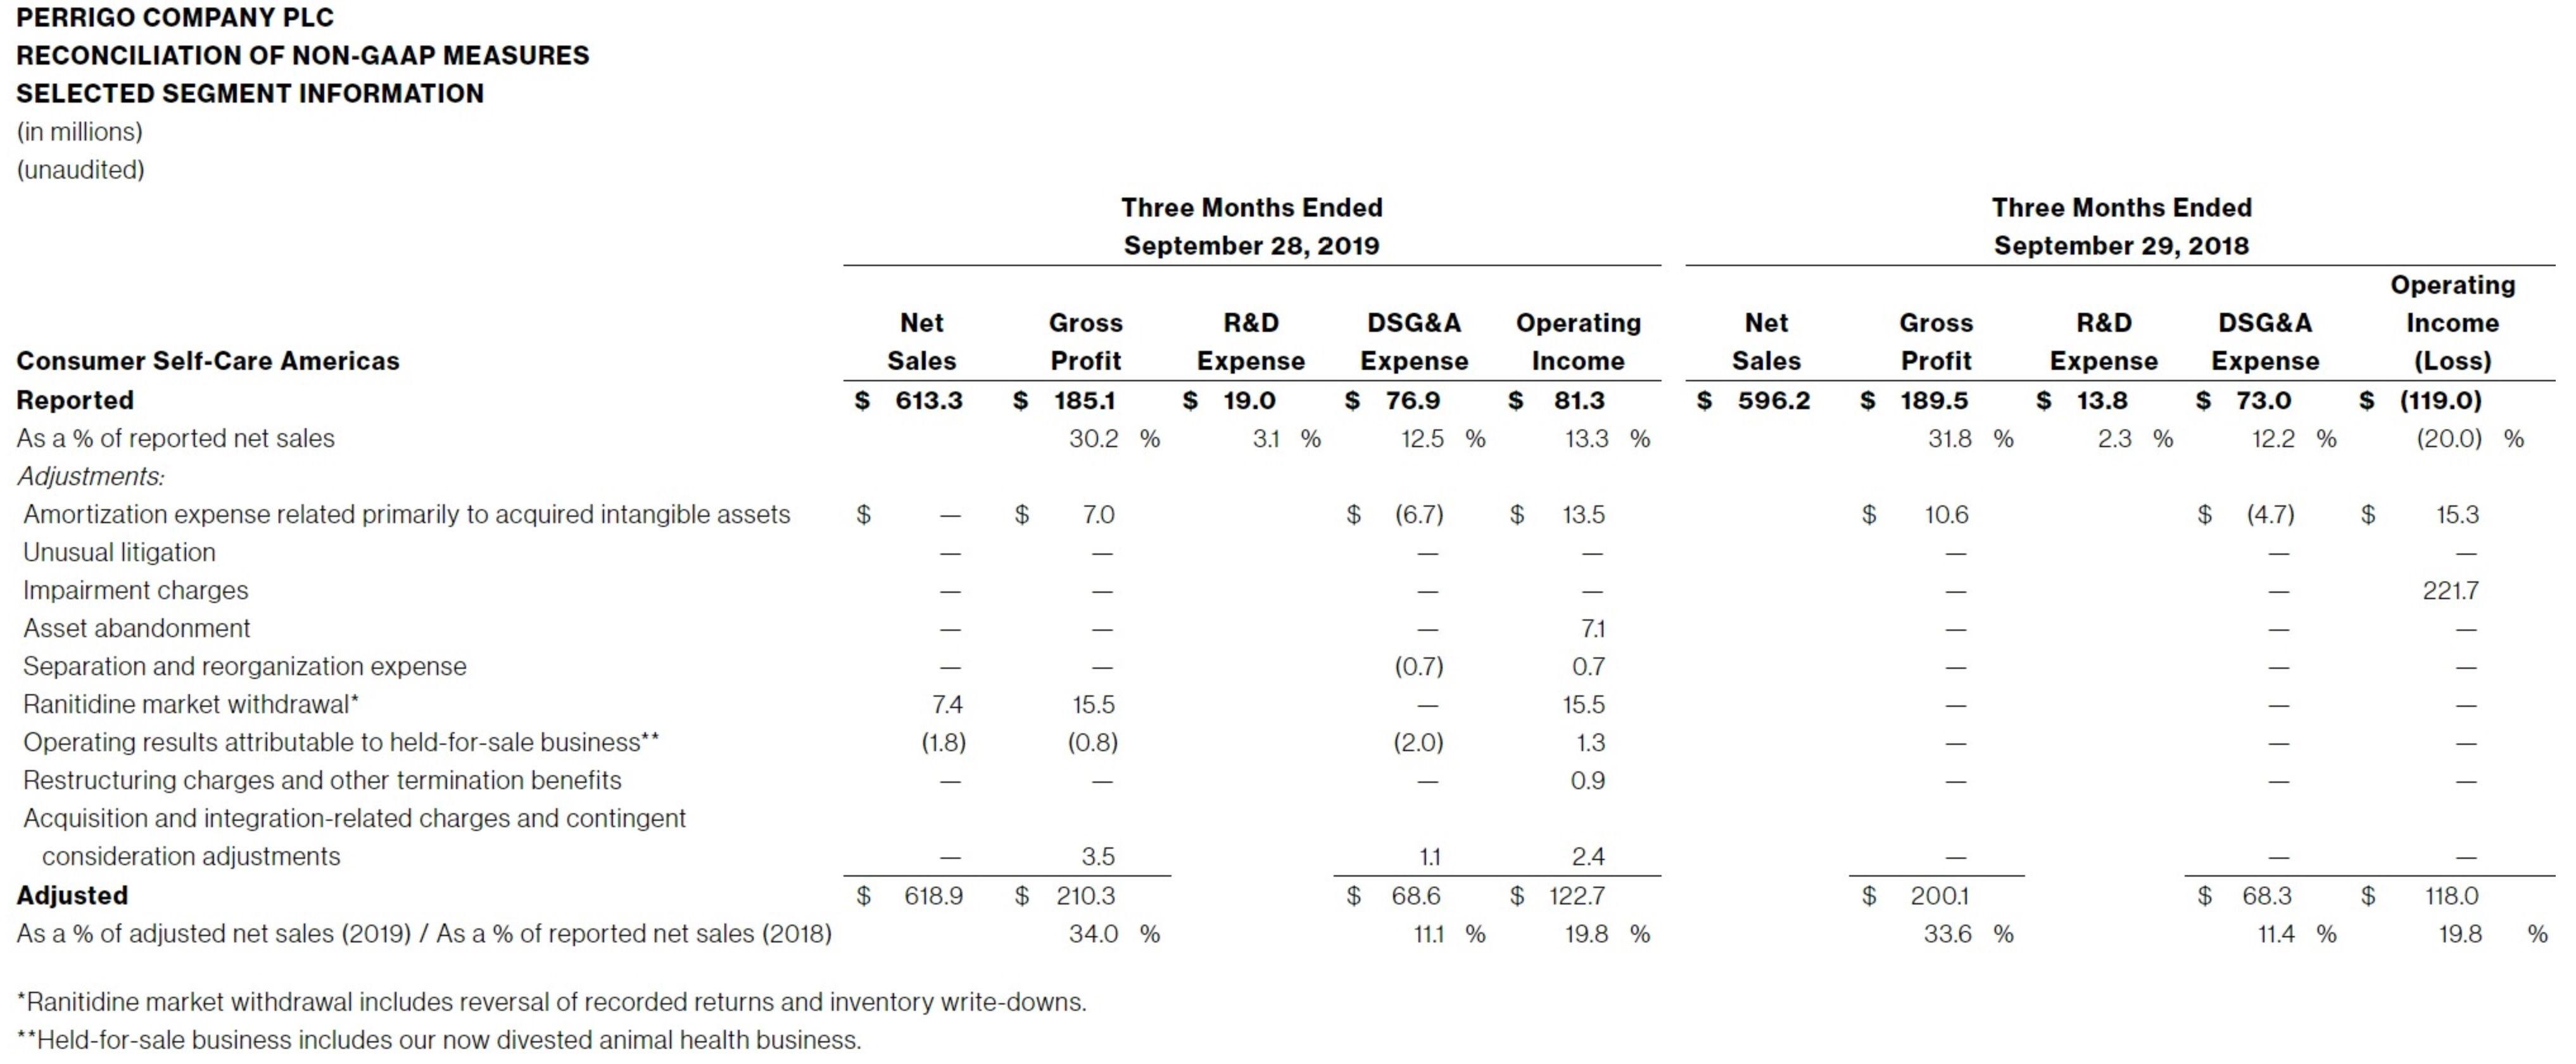 TABLE-II-(CONTINUED)-PERRIGO-COMPANY-PLC-RECONCILIATION-OF-NON-GAAP-MEASURES-SELECTED-SEGMENT-INFORMATION